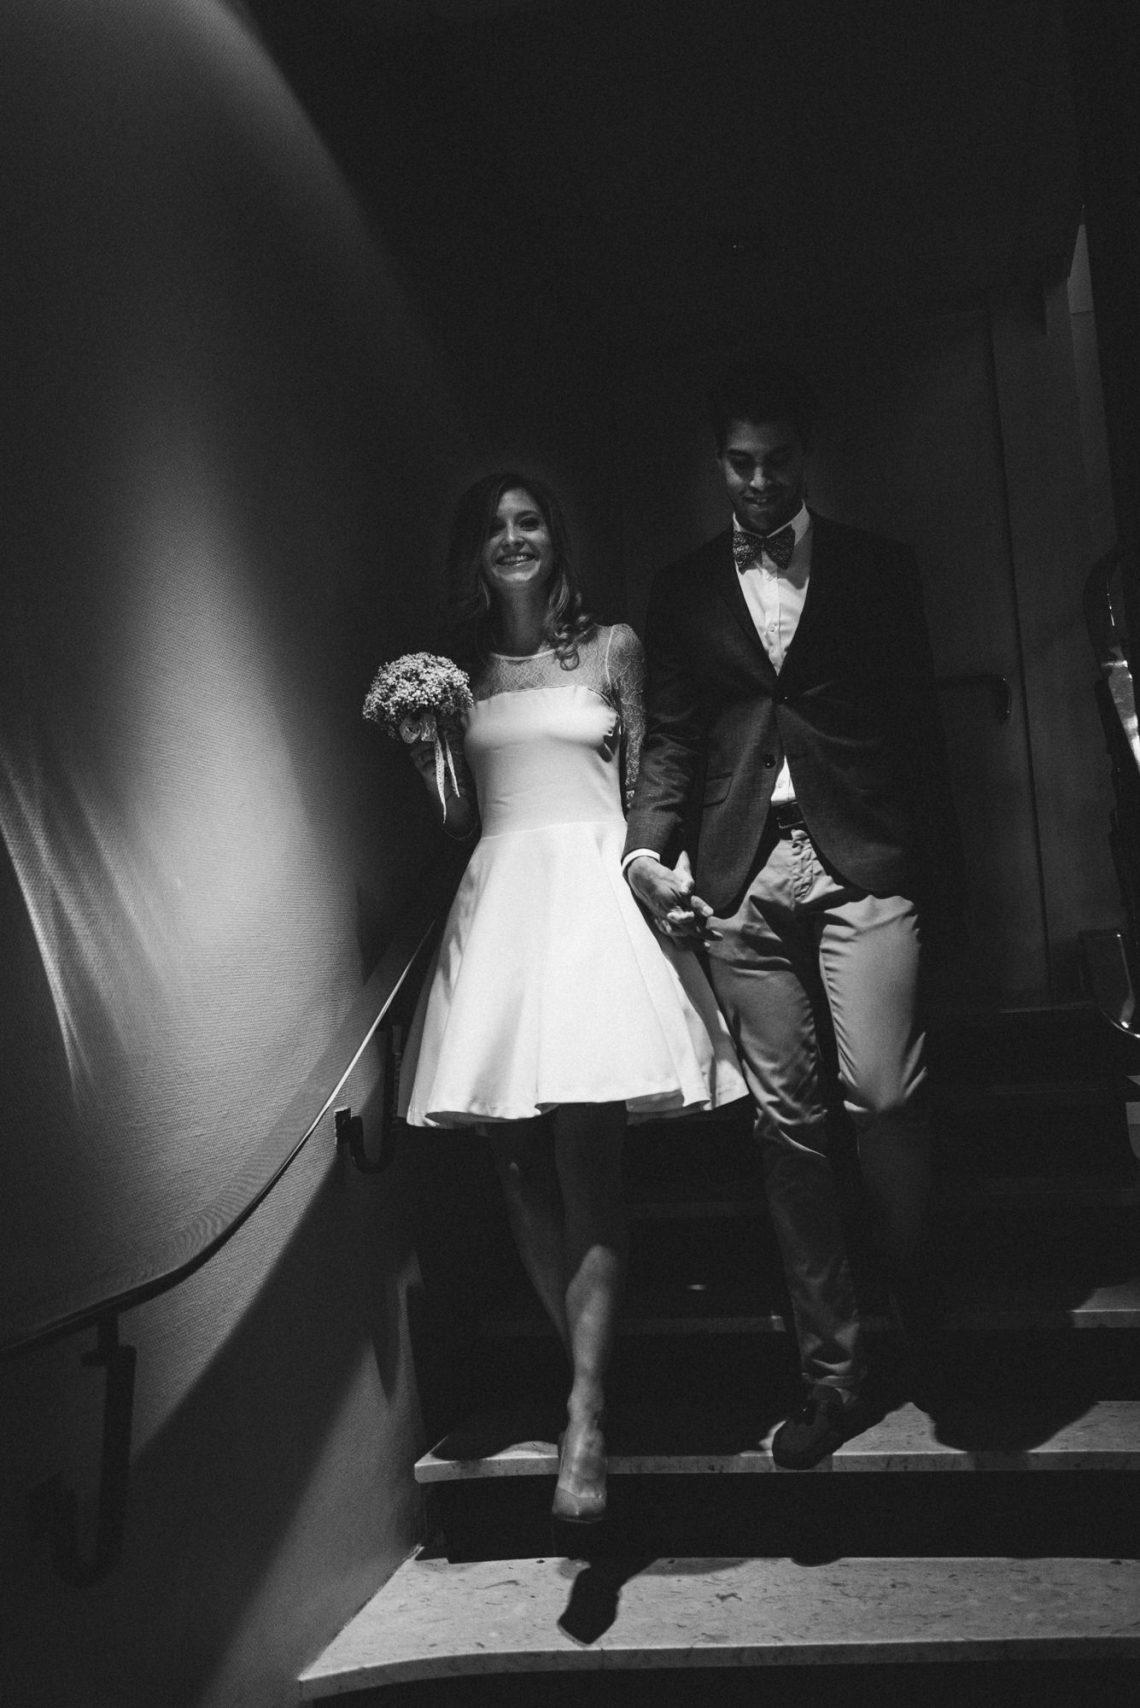 photographe-mariage-paris-nantes-provence-angers-27